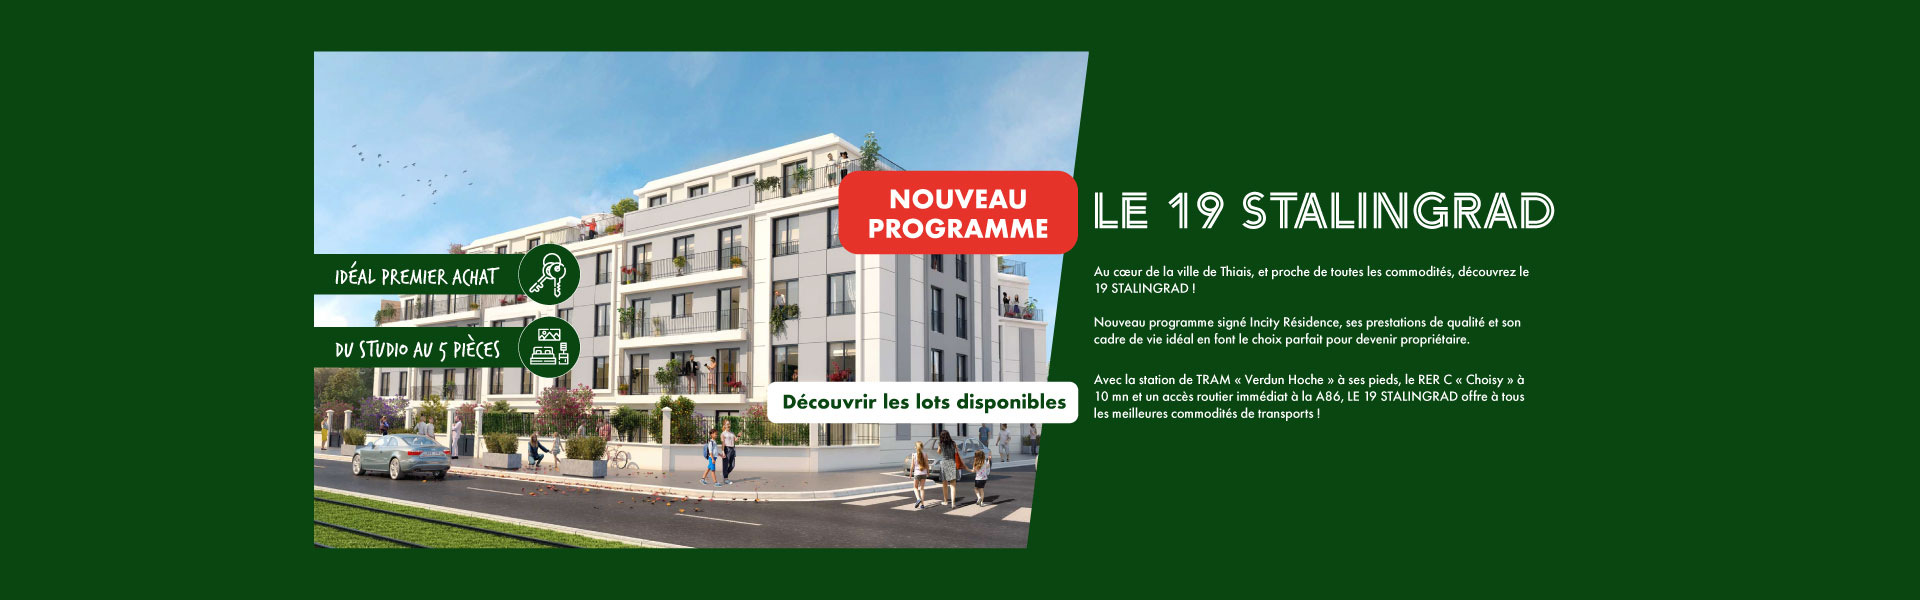 incity-residence-nouveau-programme-incity-thiais